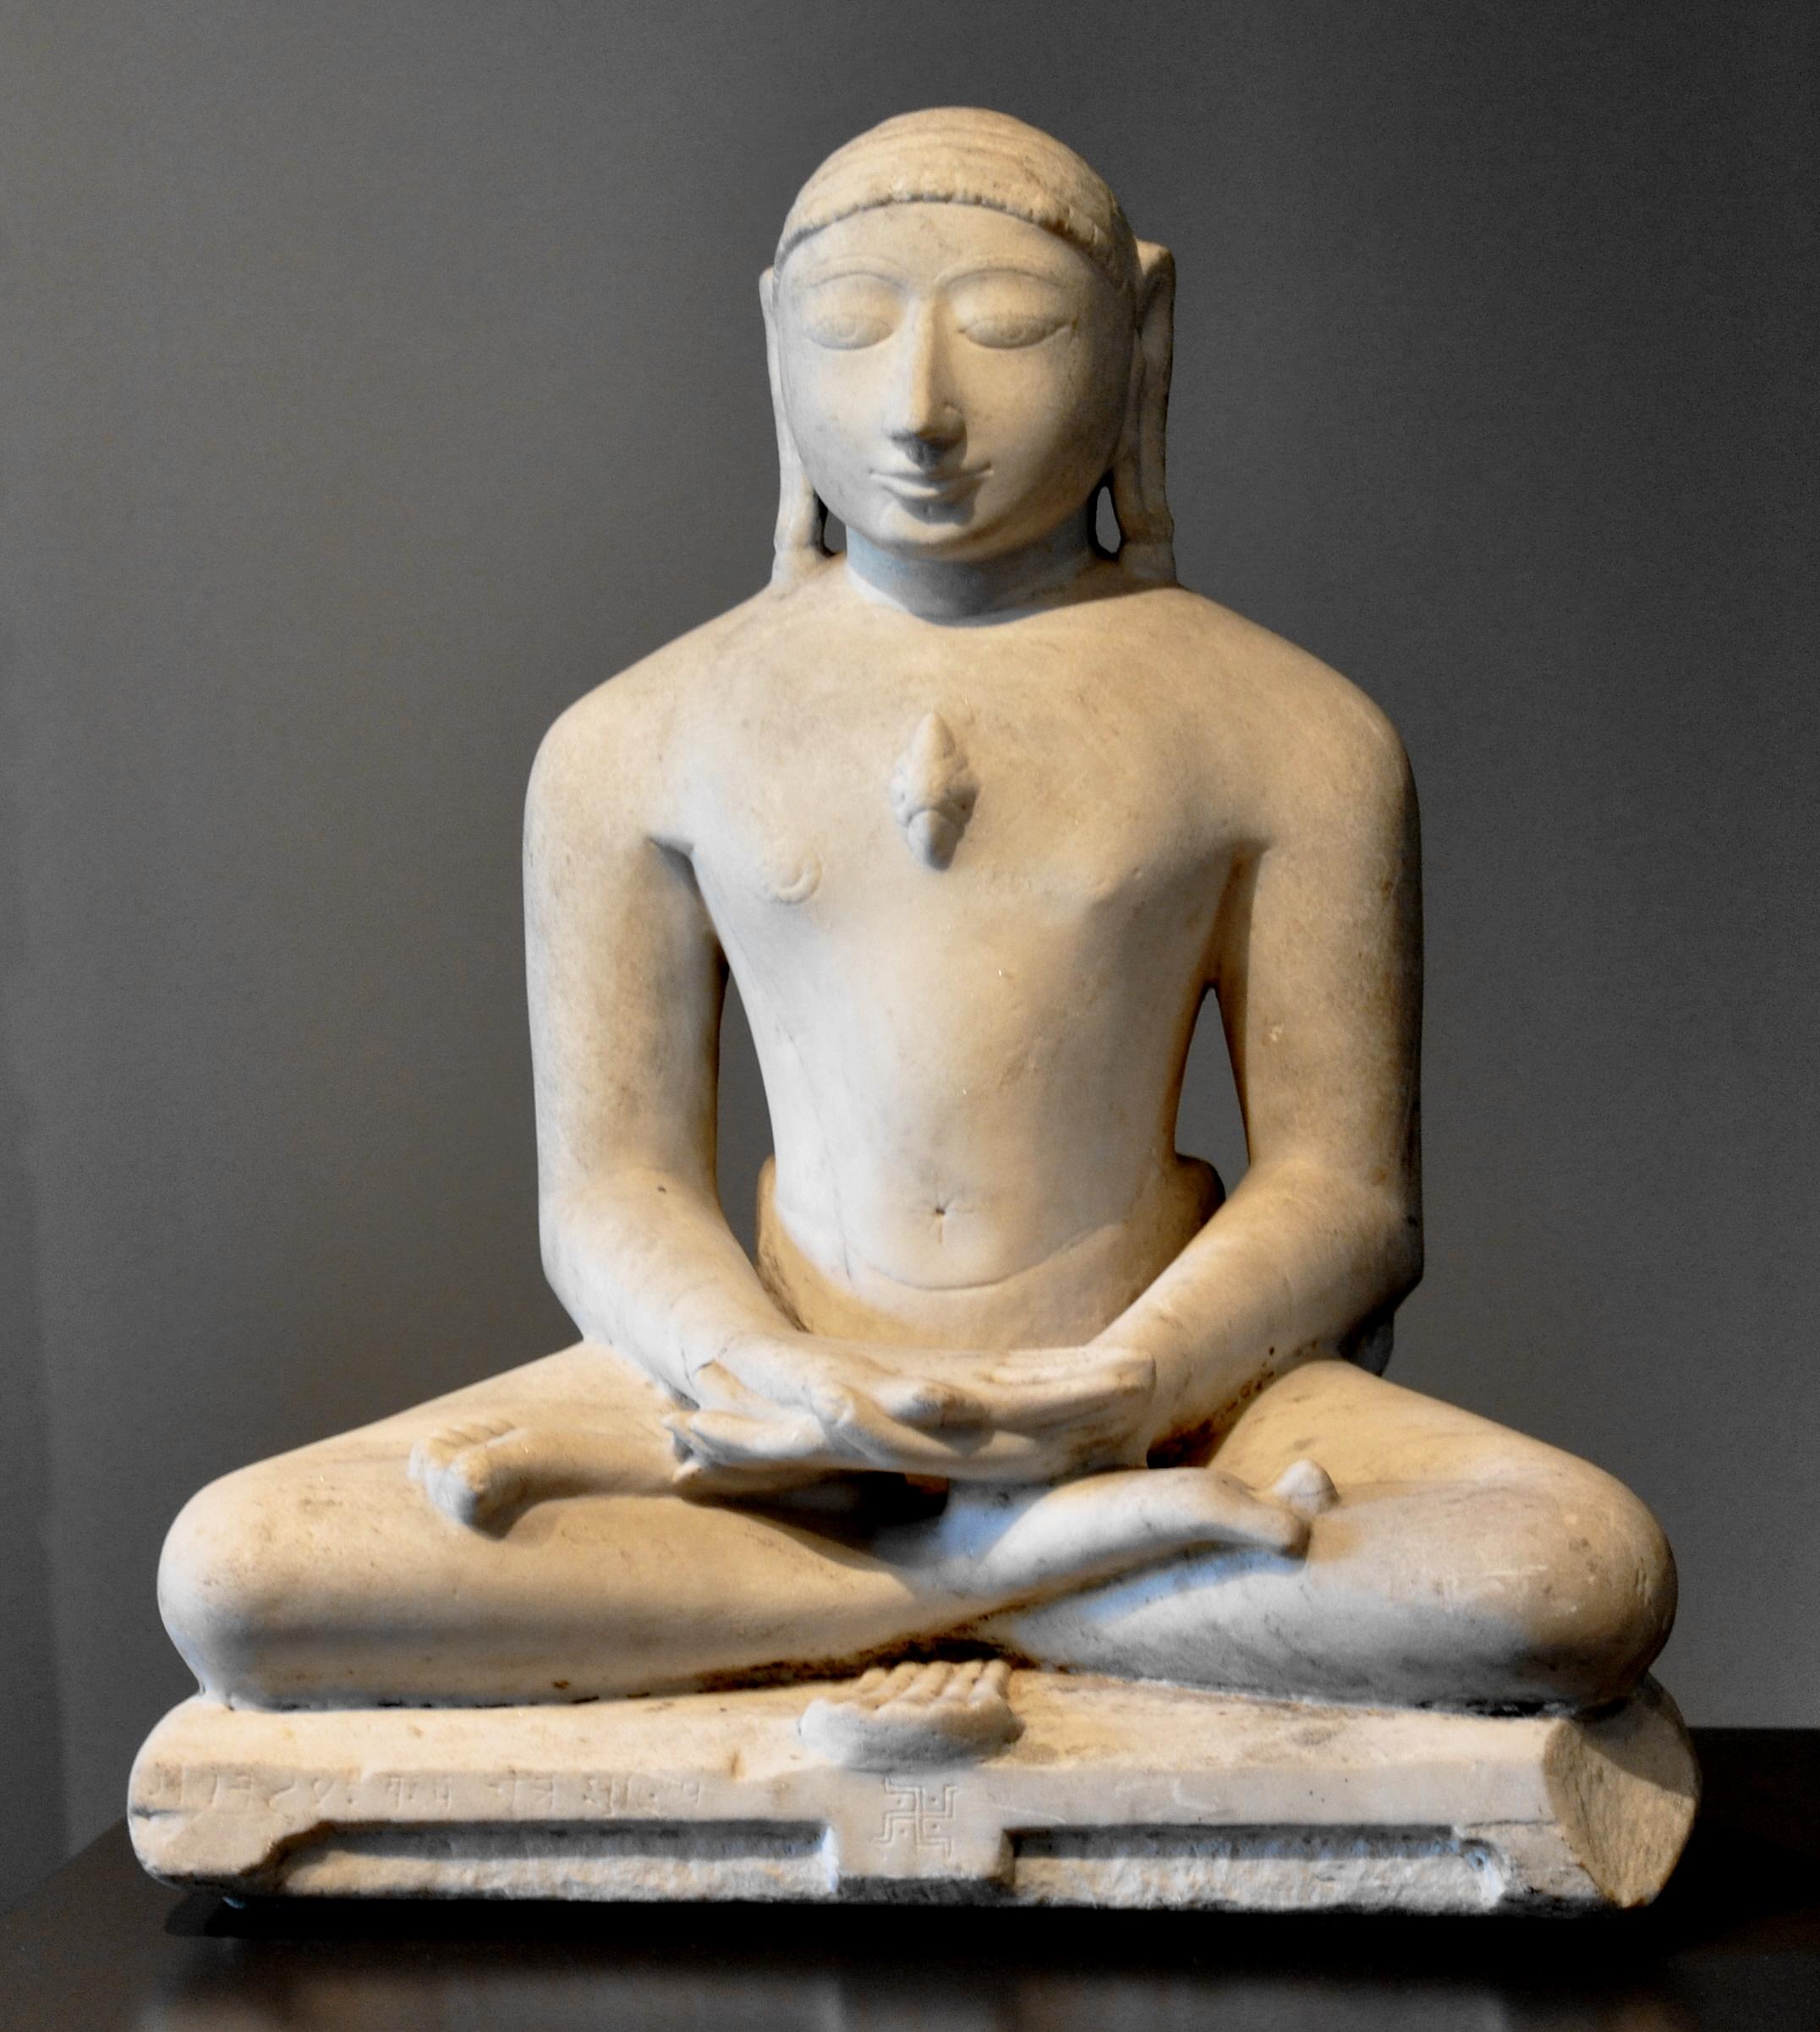 Shri Suparshvanath Chalisa   श्री सुपार्श्वनाथ चालीसा   Suparasnath Chalisa